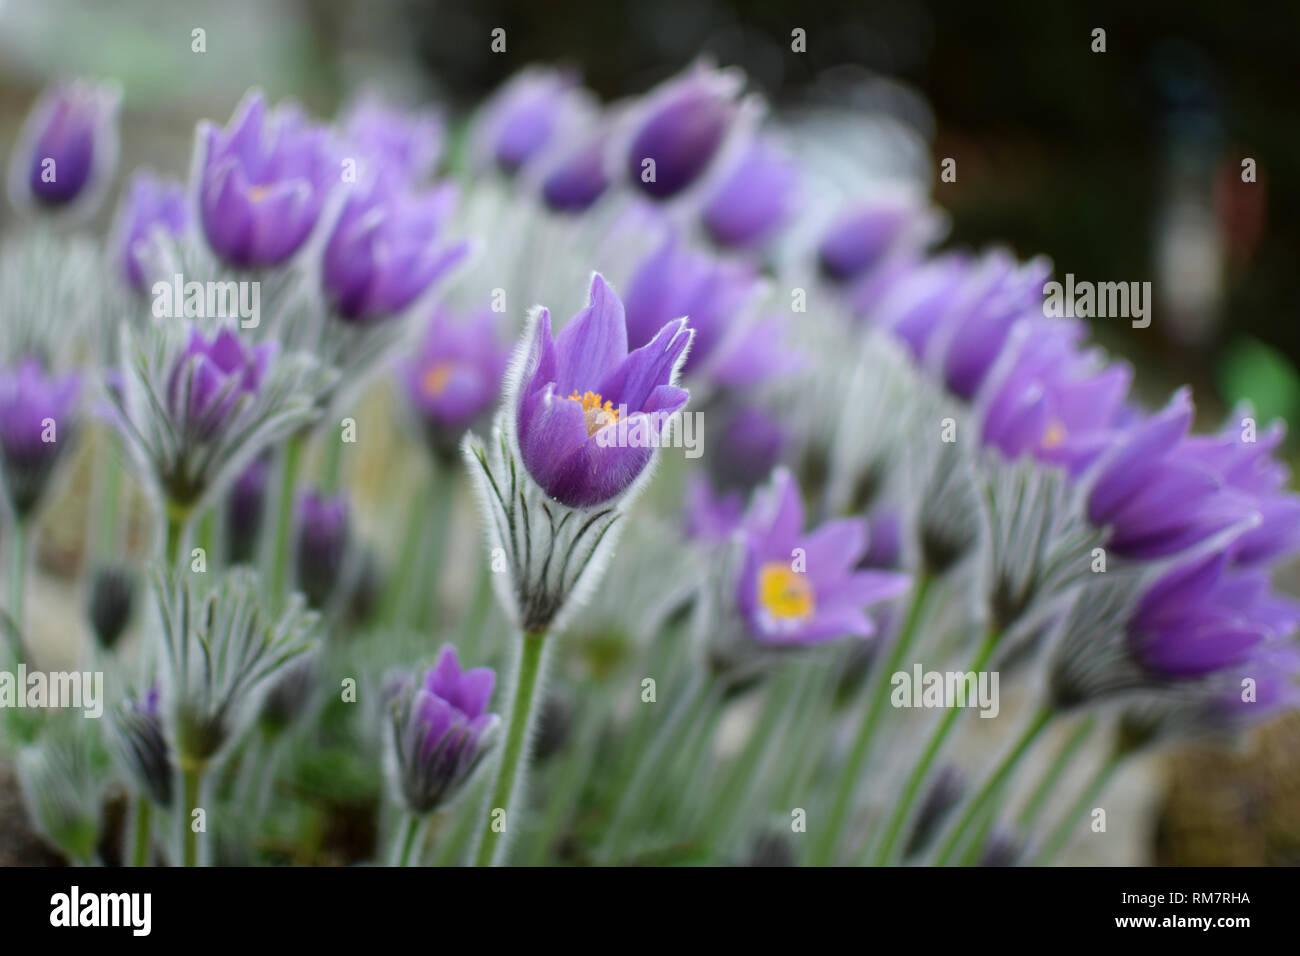 'Pulsatilla patens' - Prairie Crocus. Violet flowers close up. - Stock Image